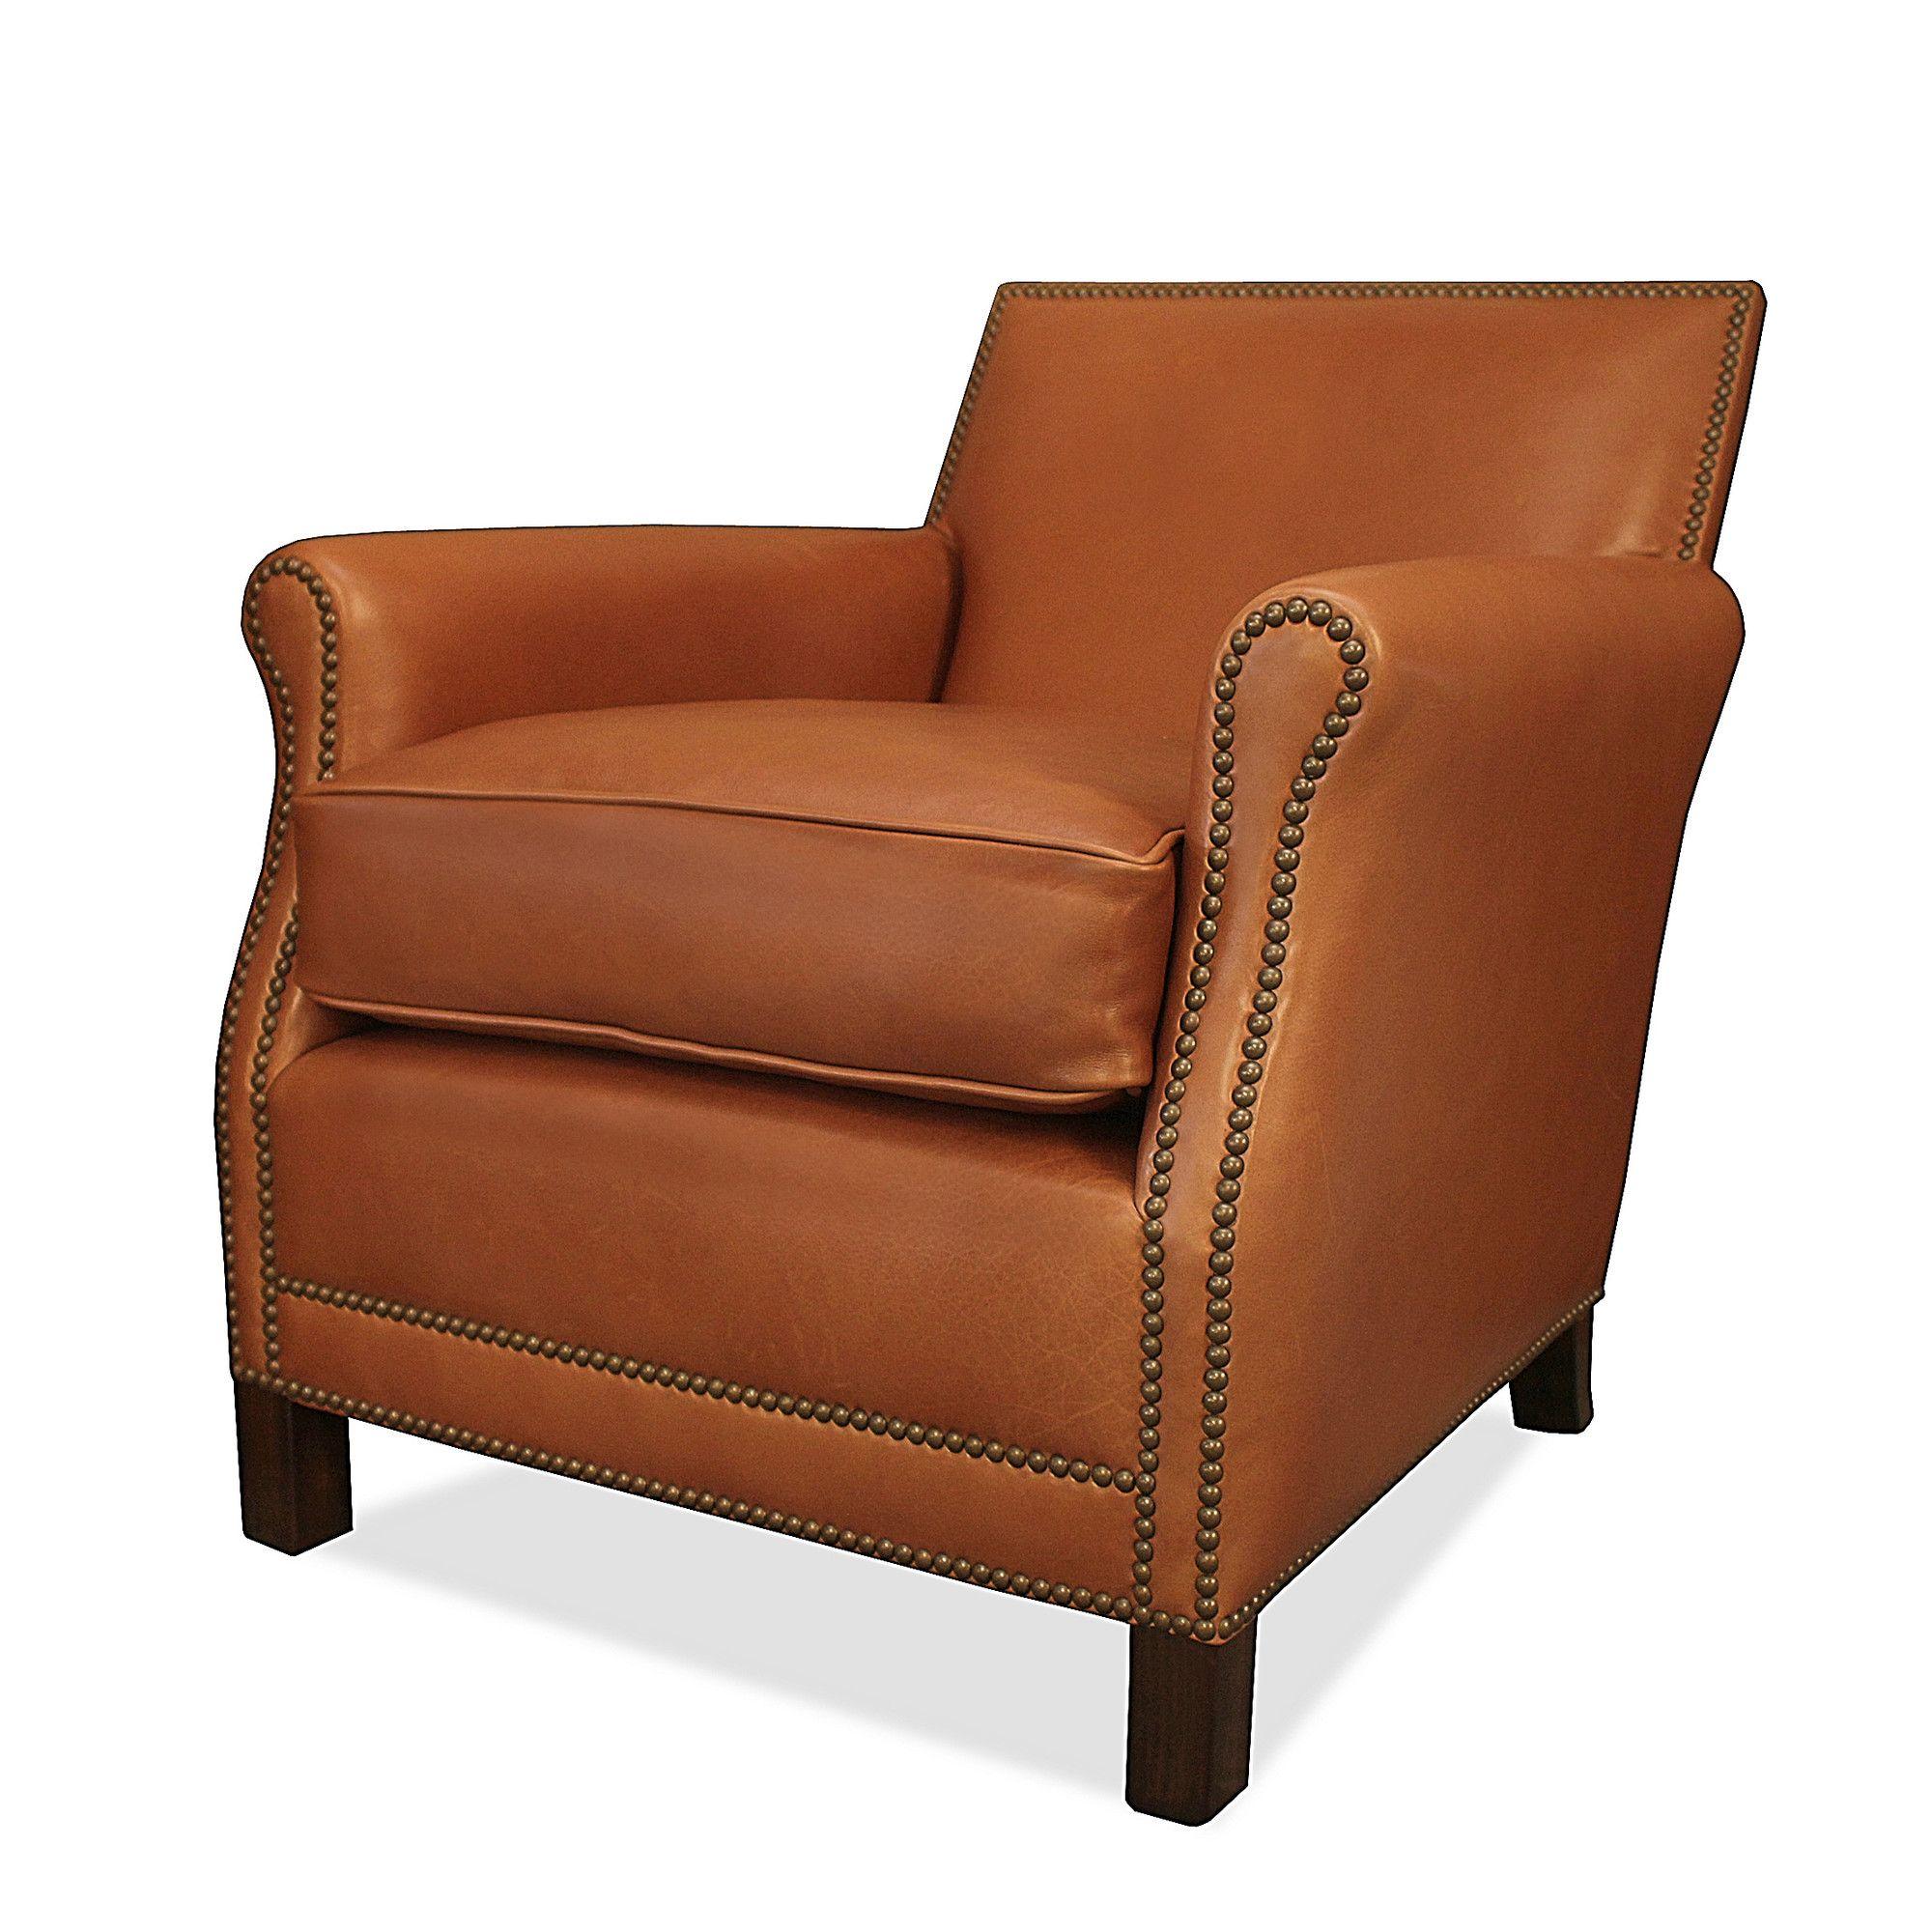 Fantastic Salzburg Leather Arm Chair Wayfair Home Accent Chairs Bralicious Painted Fabric Chair Ideas Braliciousco